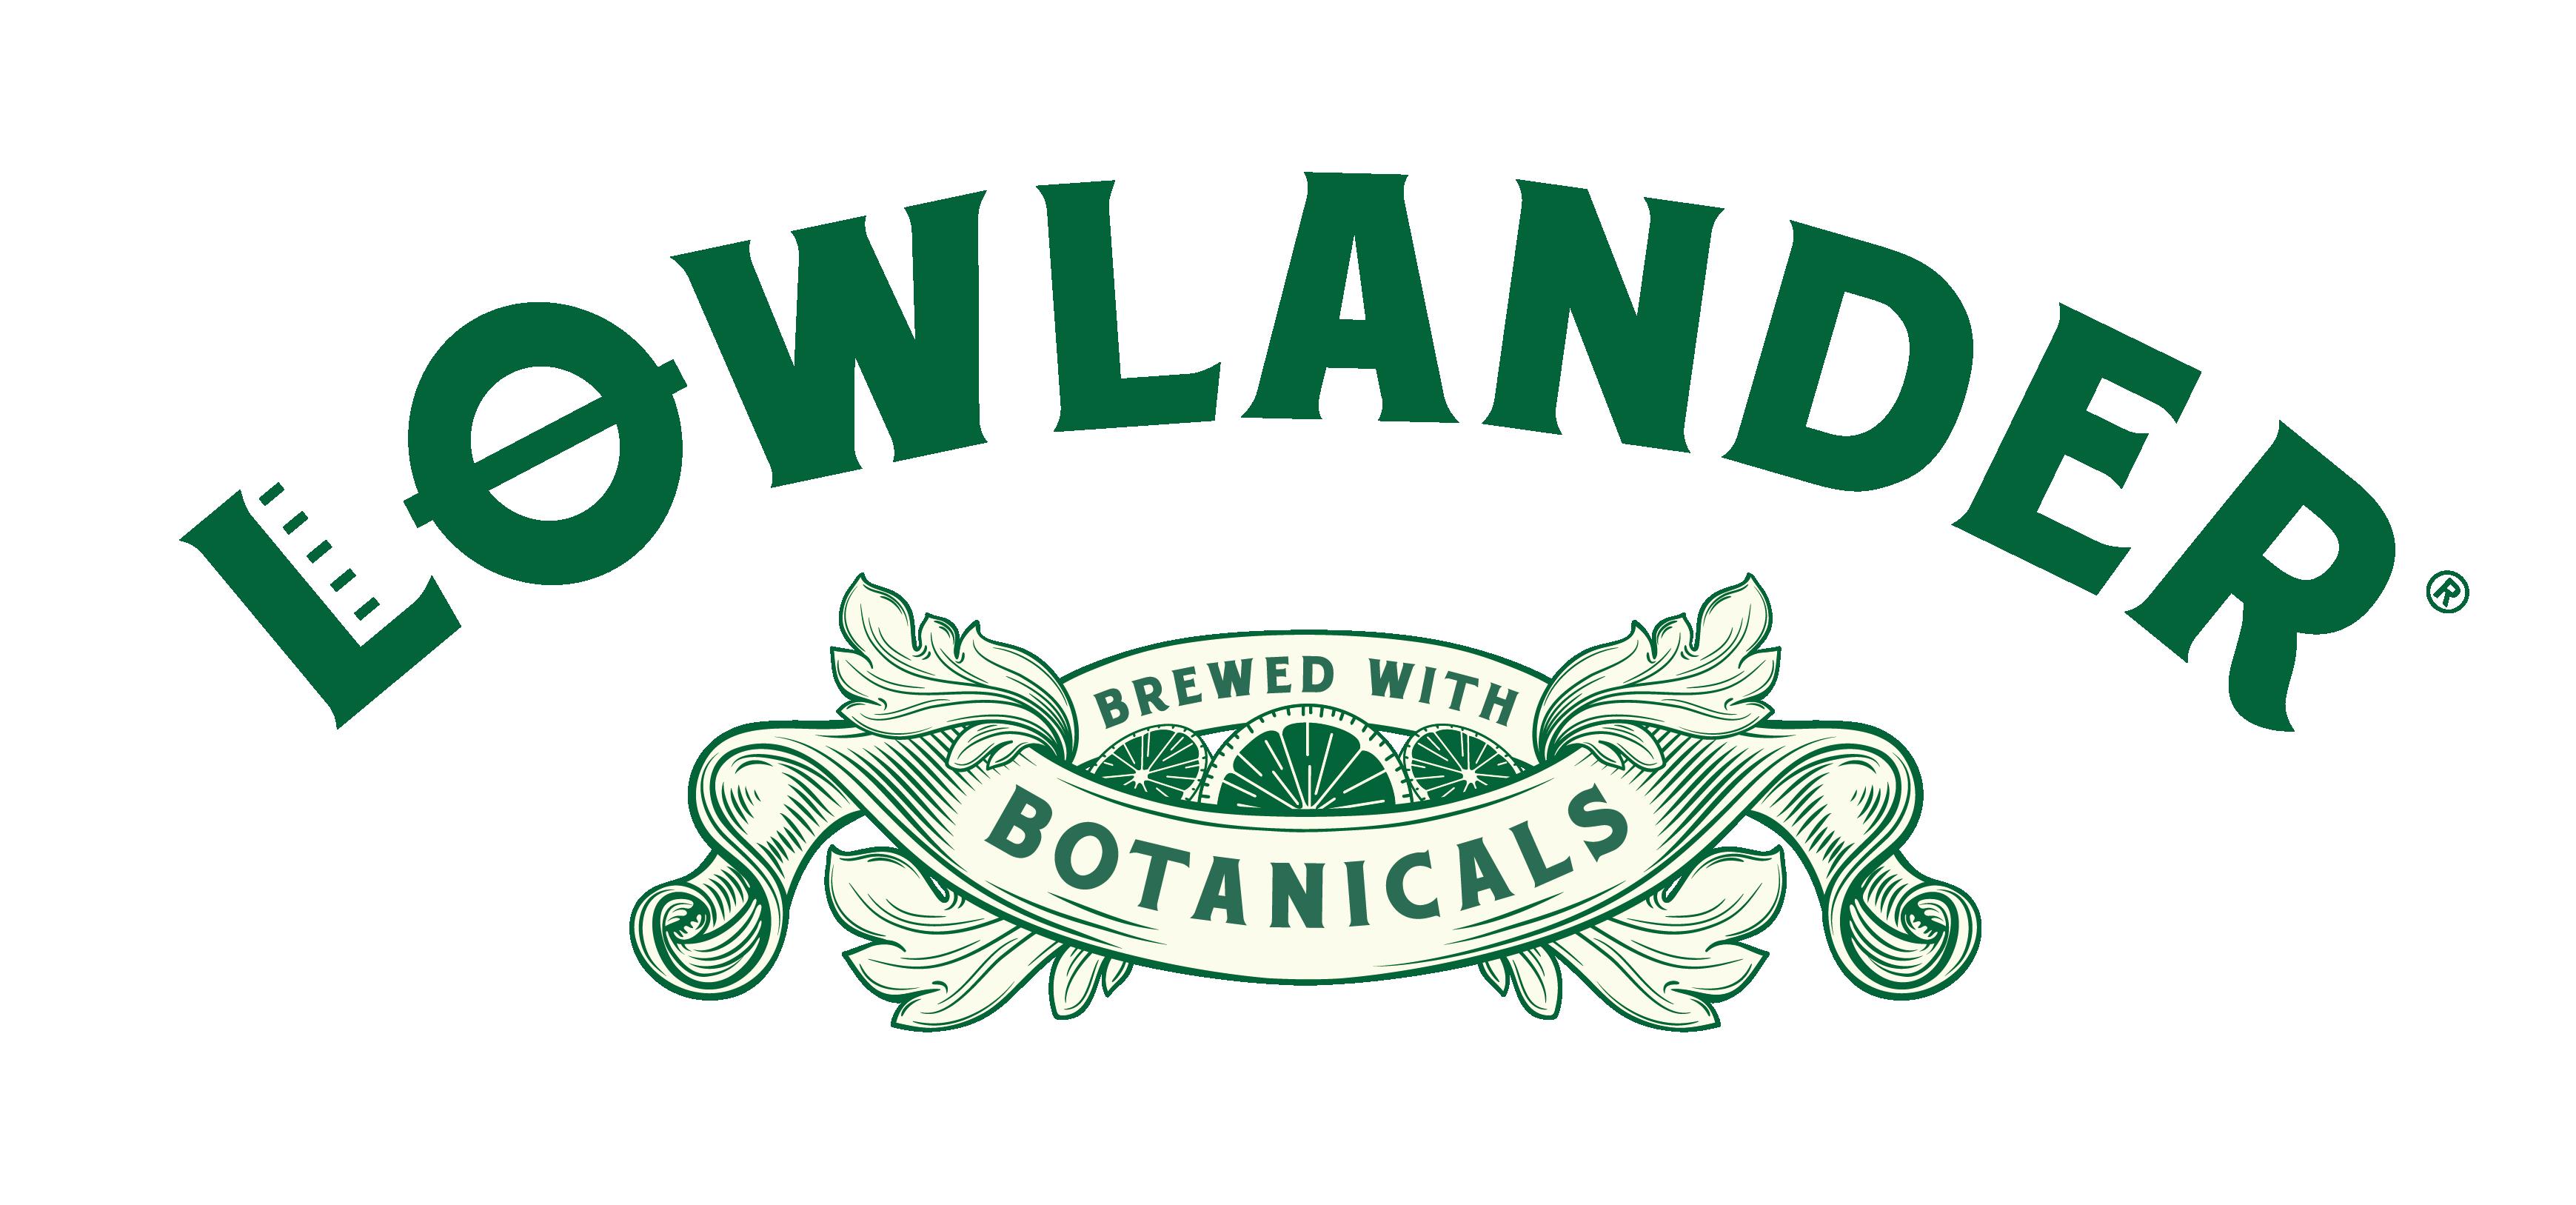 Lowlander Beer